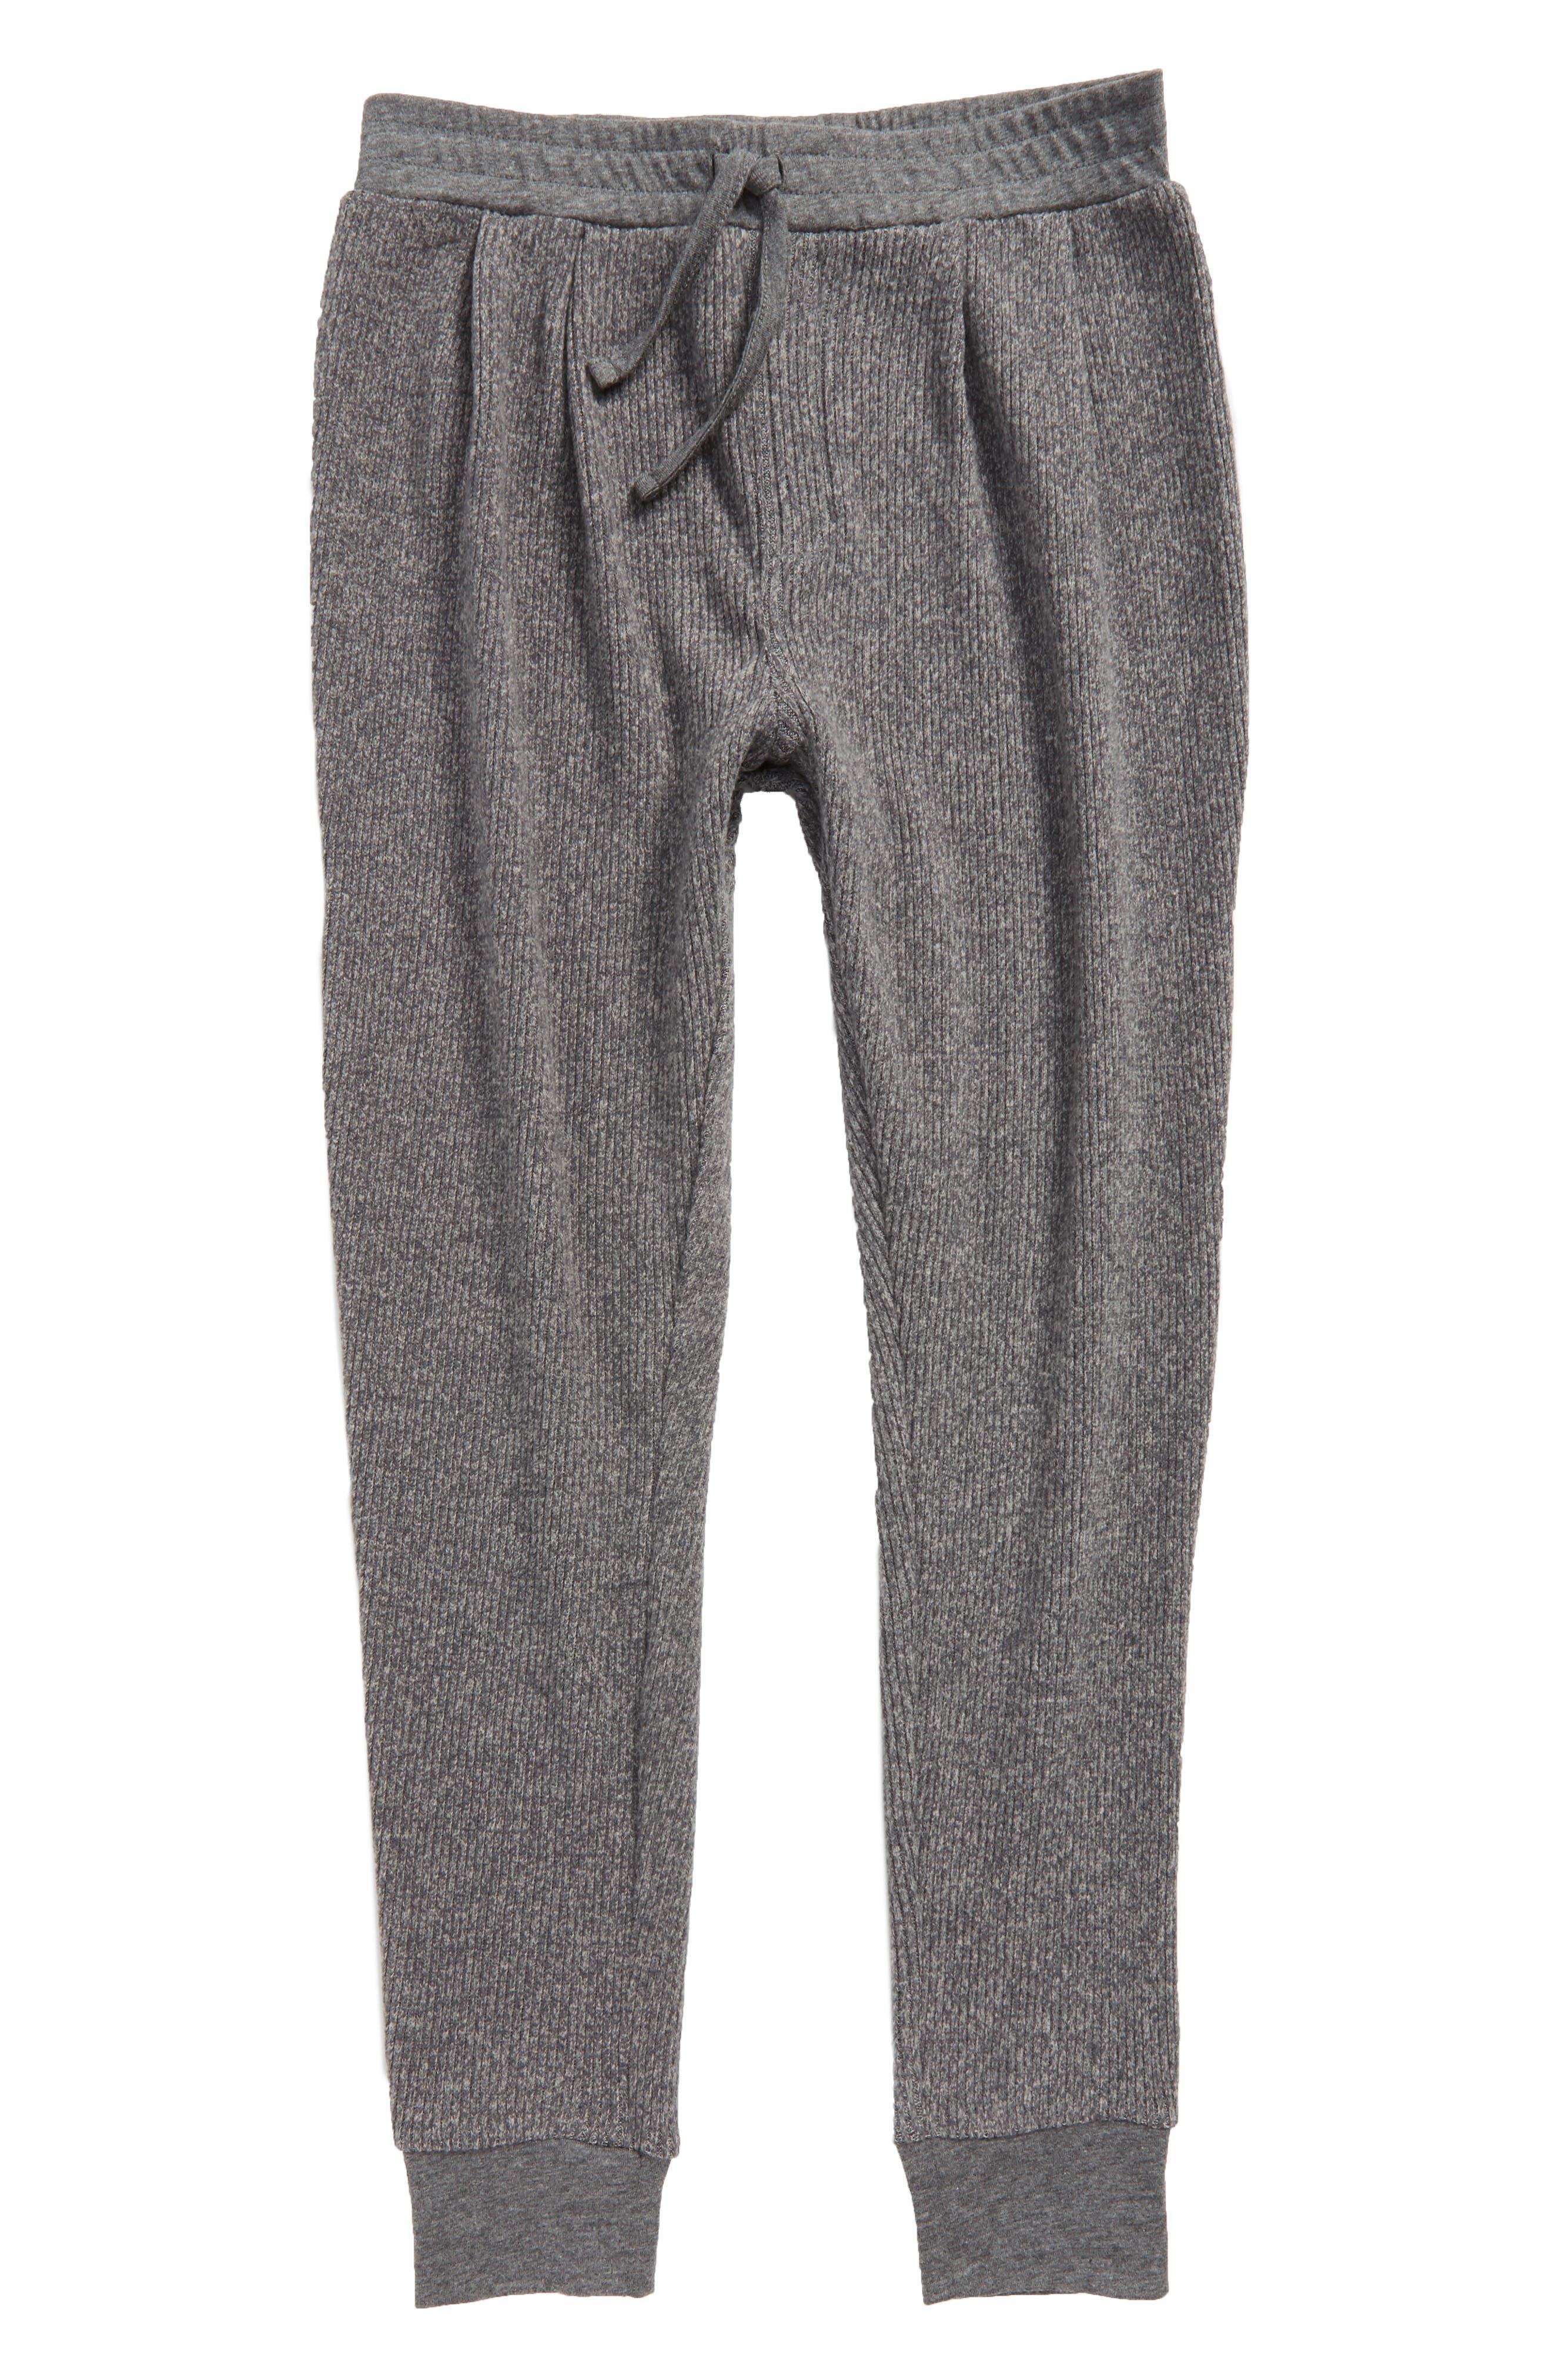 Knit Jogger Pants,                         Main,                         color, Grey Charcoal Heather